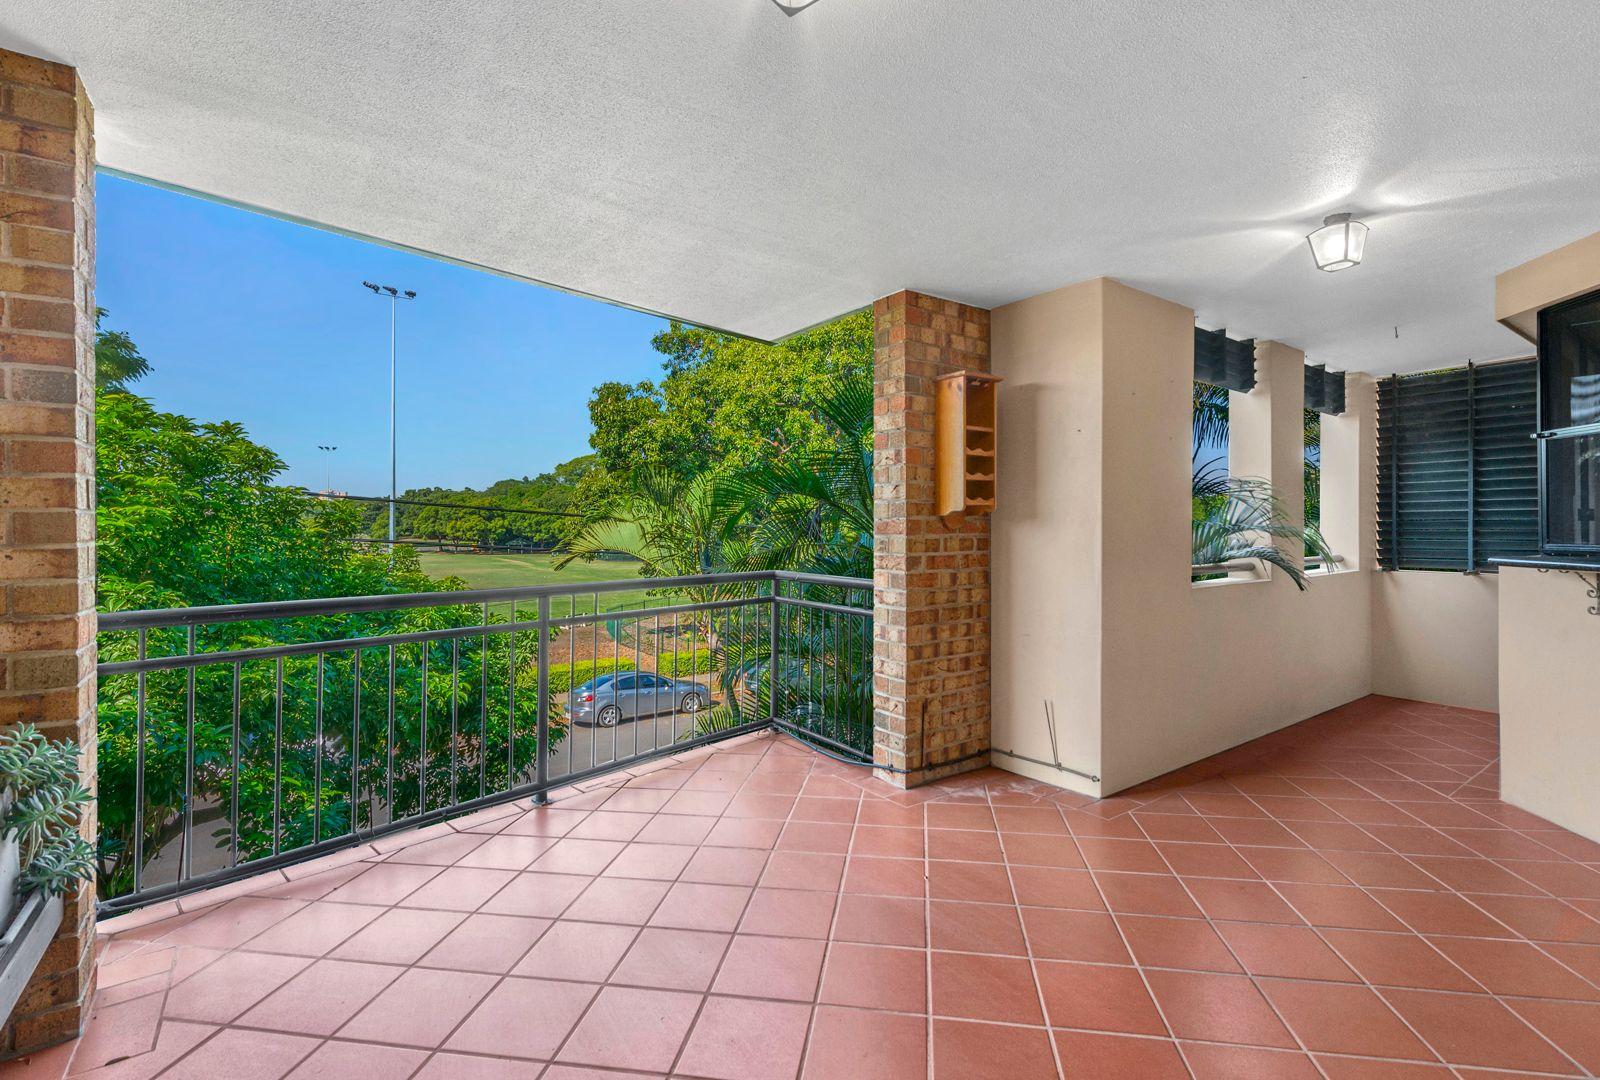 7/108 Sydney Street, New Farm QLD 4005, Image 1